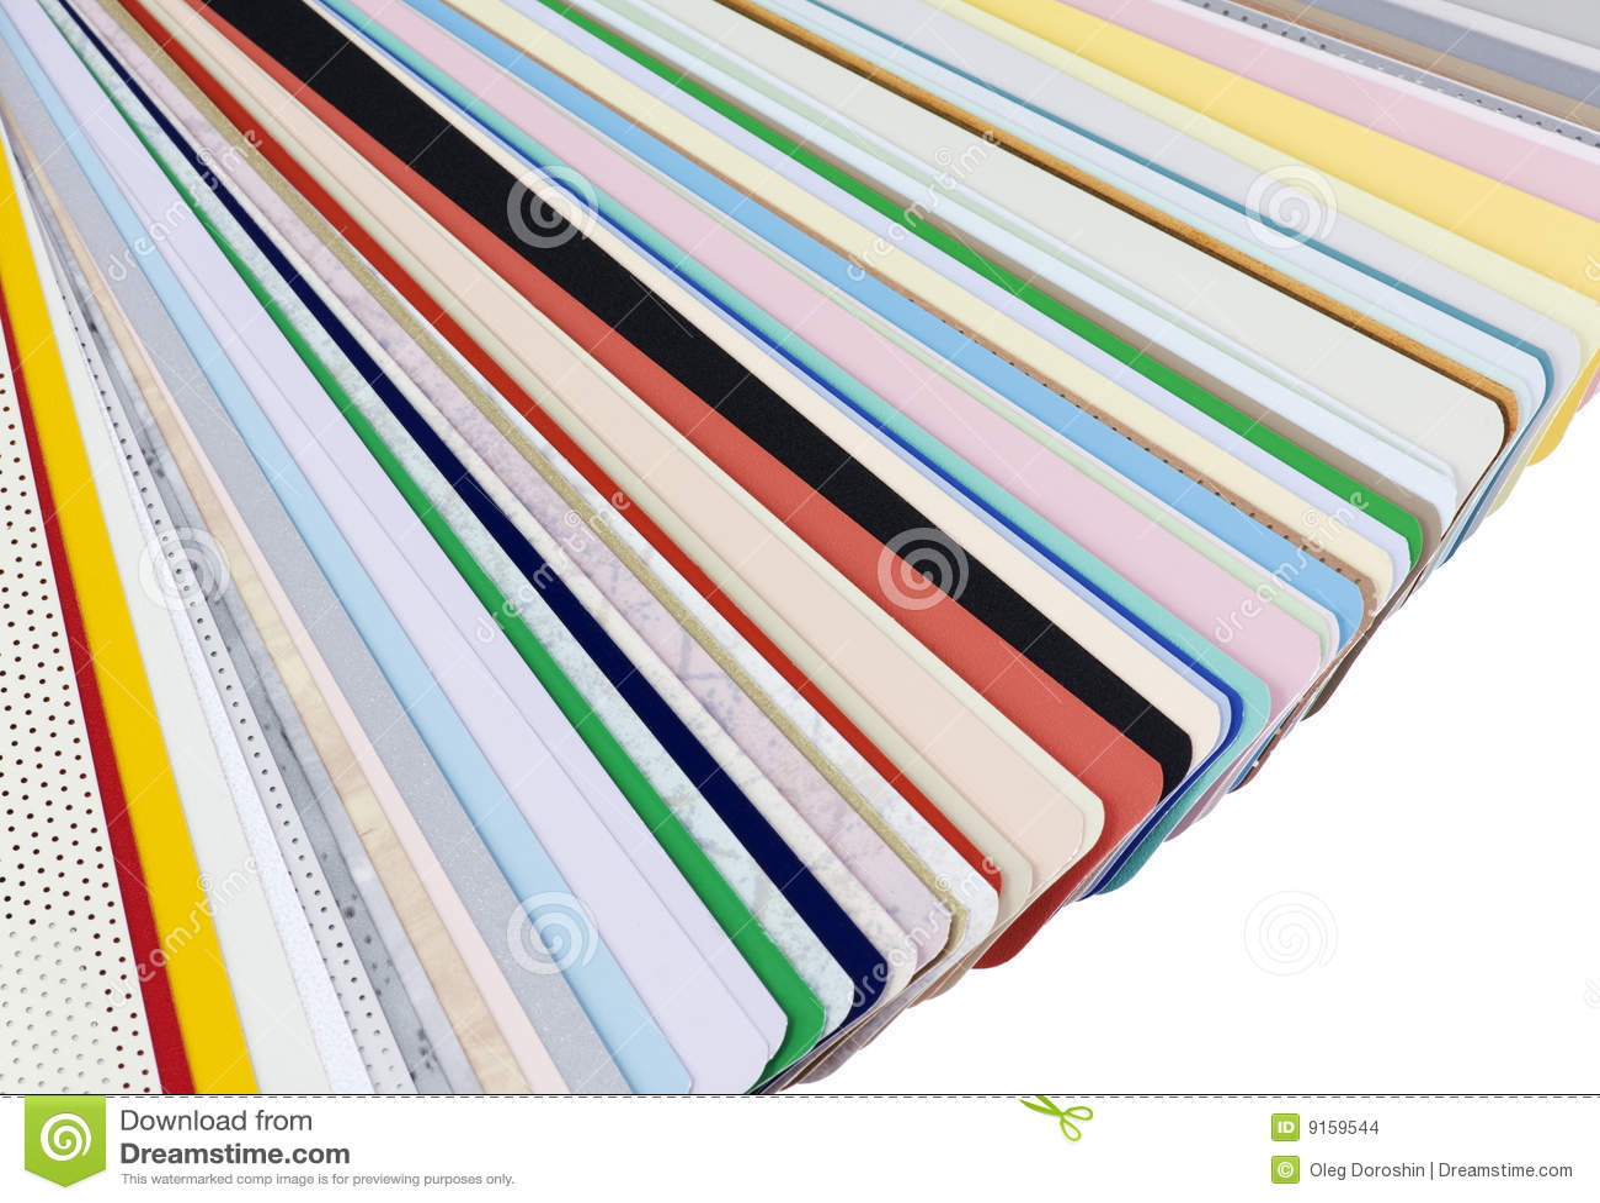 Texture blinds